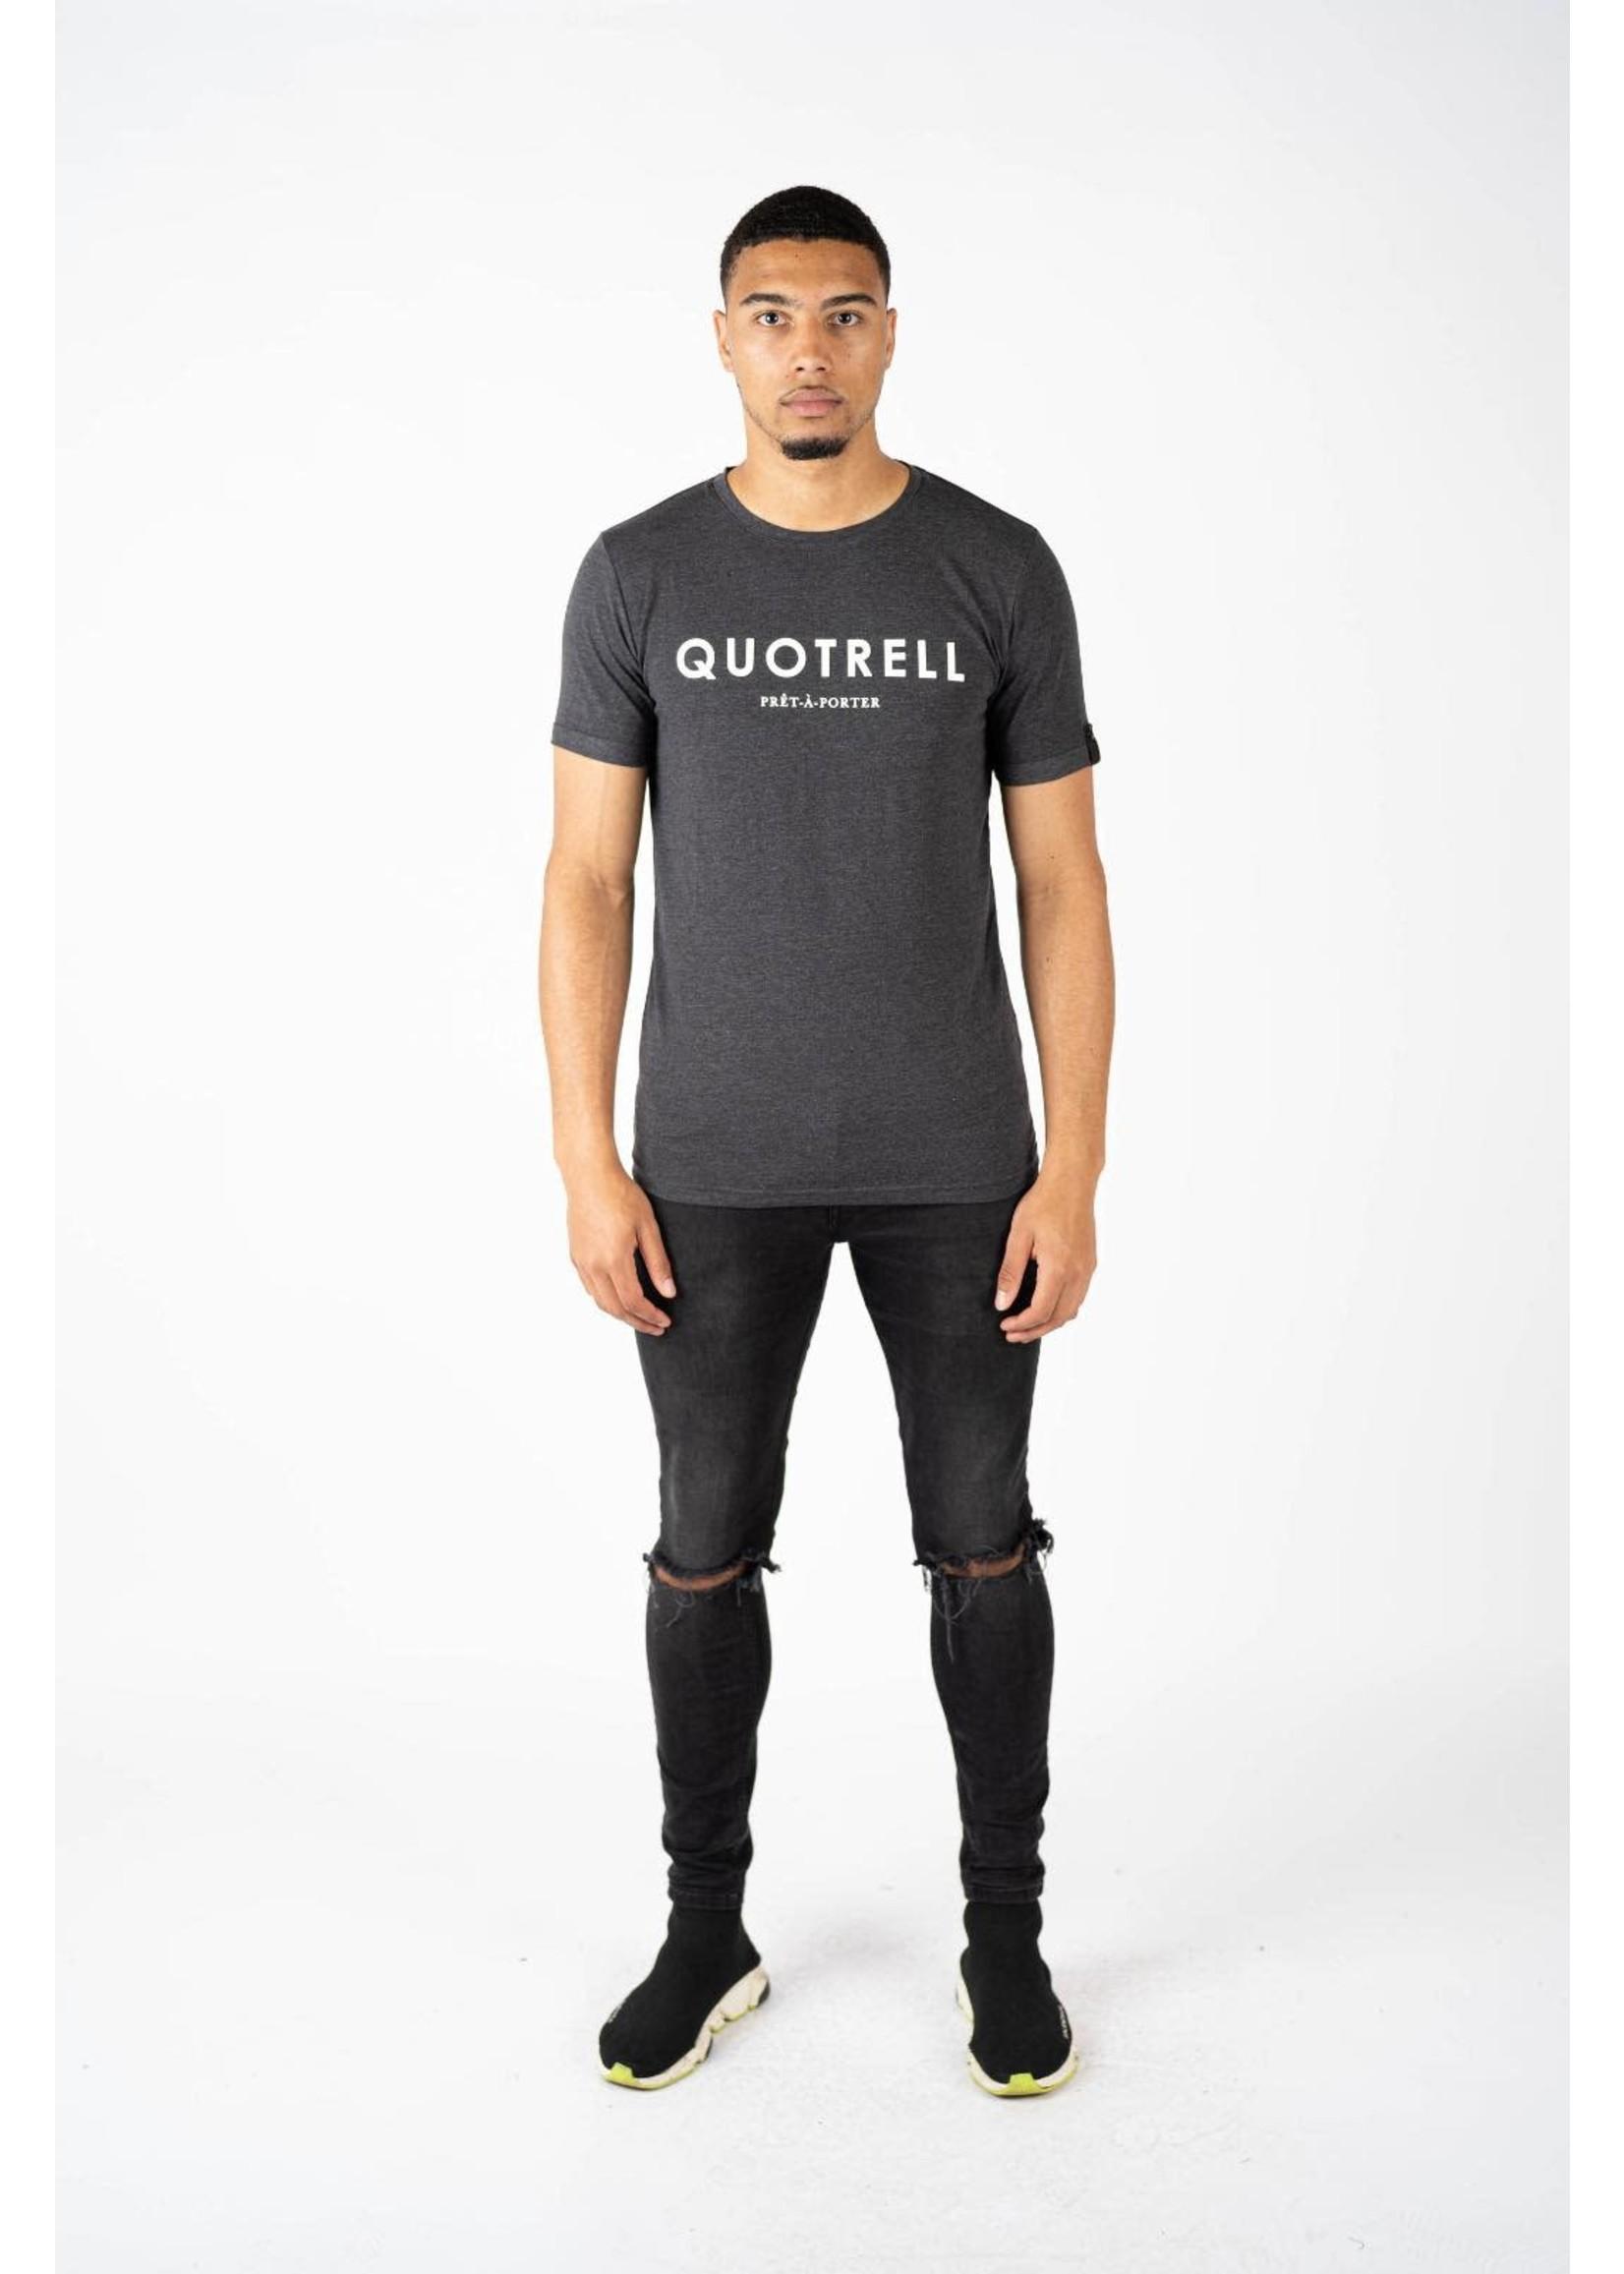 Quotrell QUOTRELL Basic T-Shirt - Grey